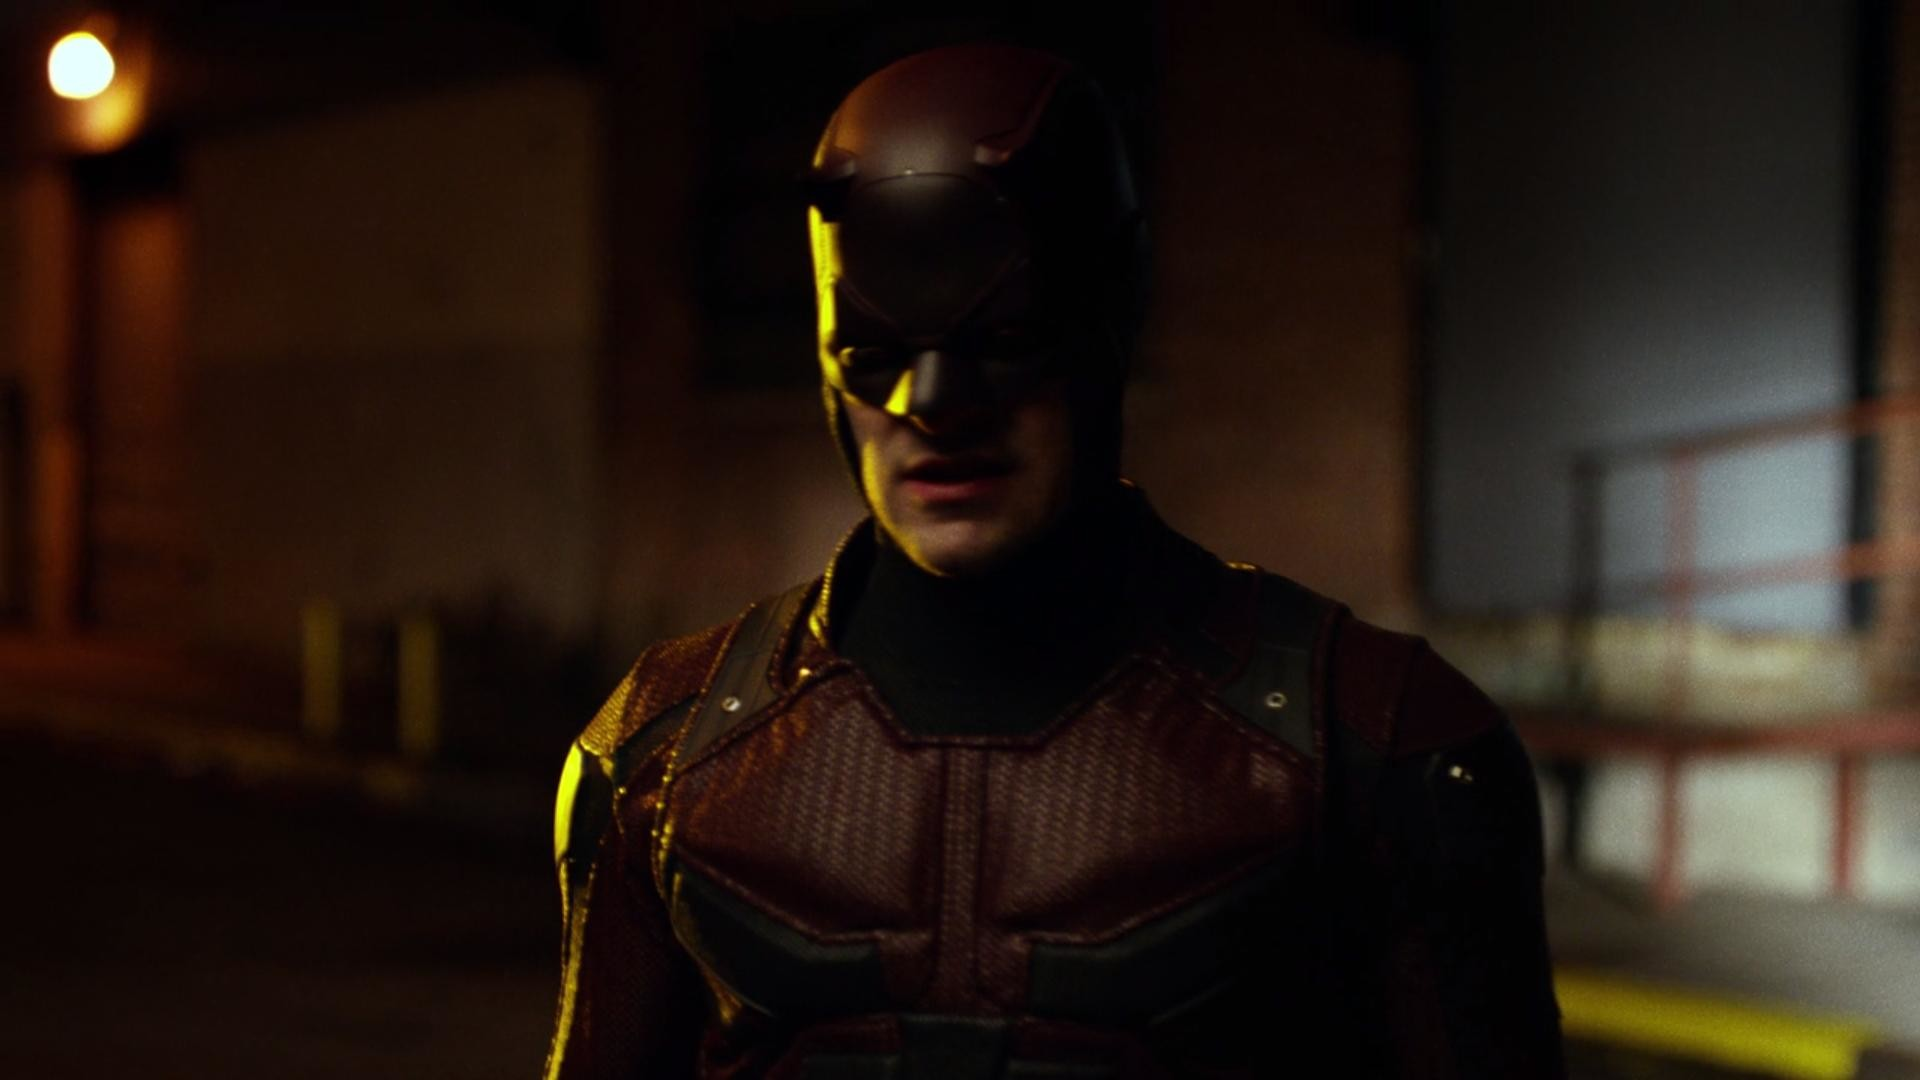 Netflix Daredevil HD Wallpaper – WallpaperSafari